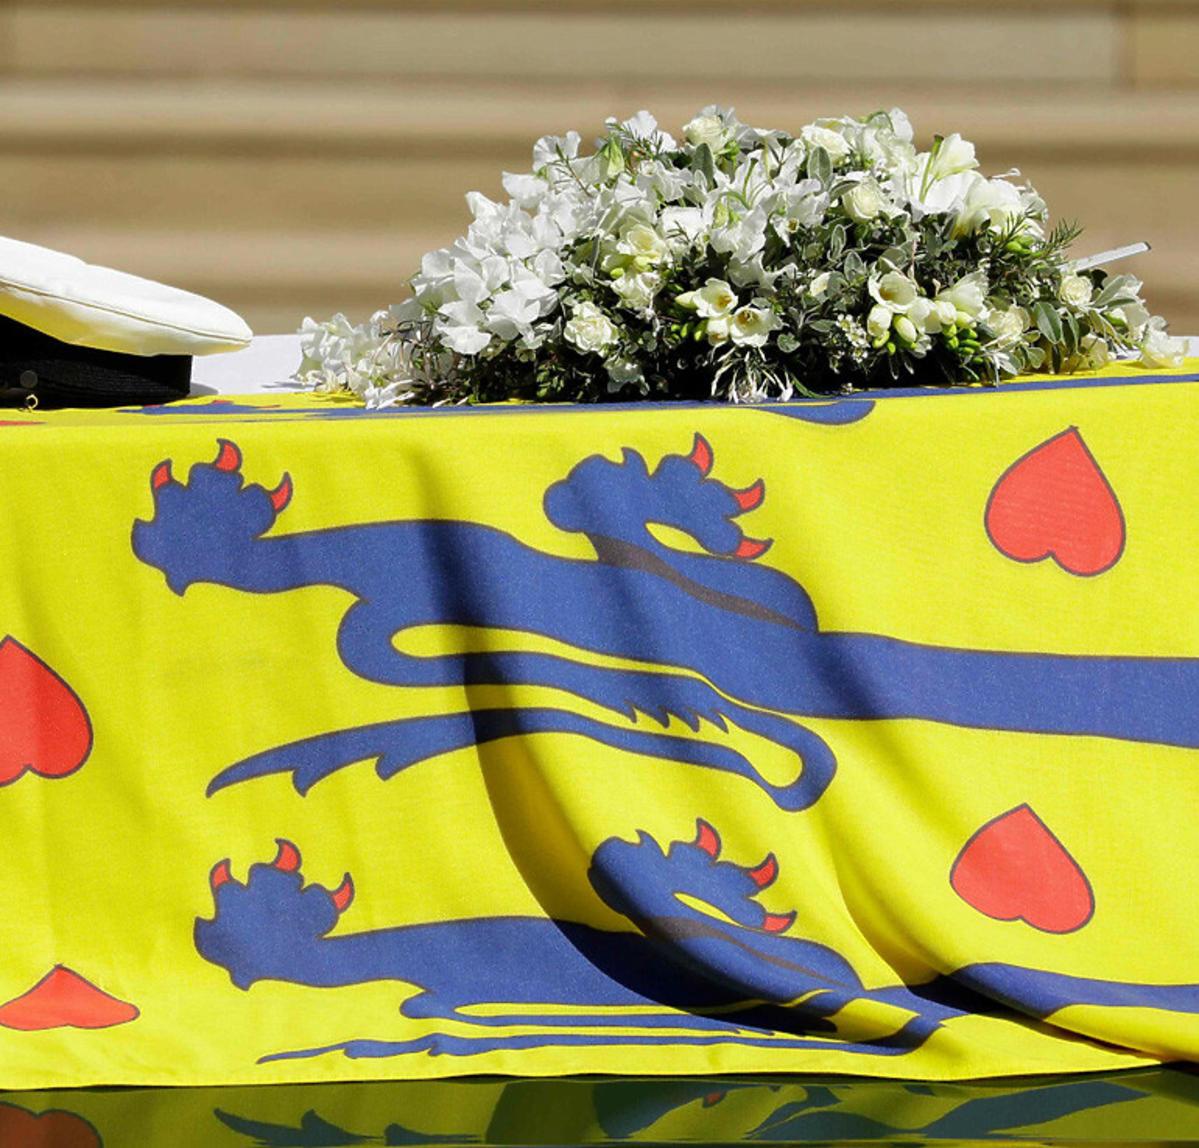 Pogrzeb księcia Filipa - trumna księcia Filipa